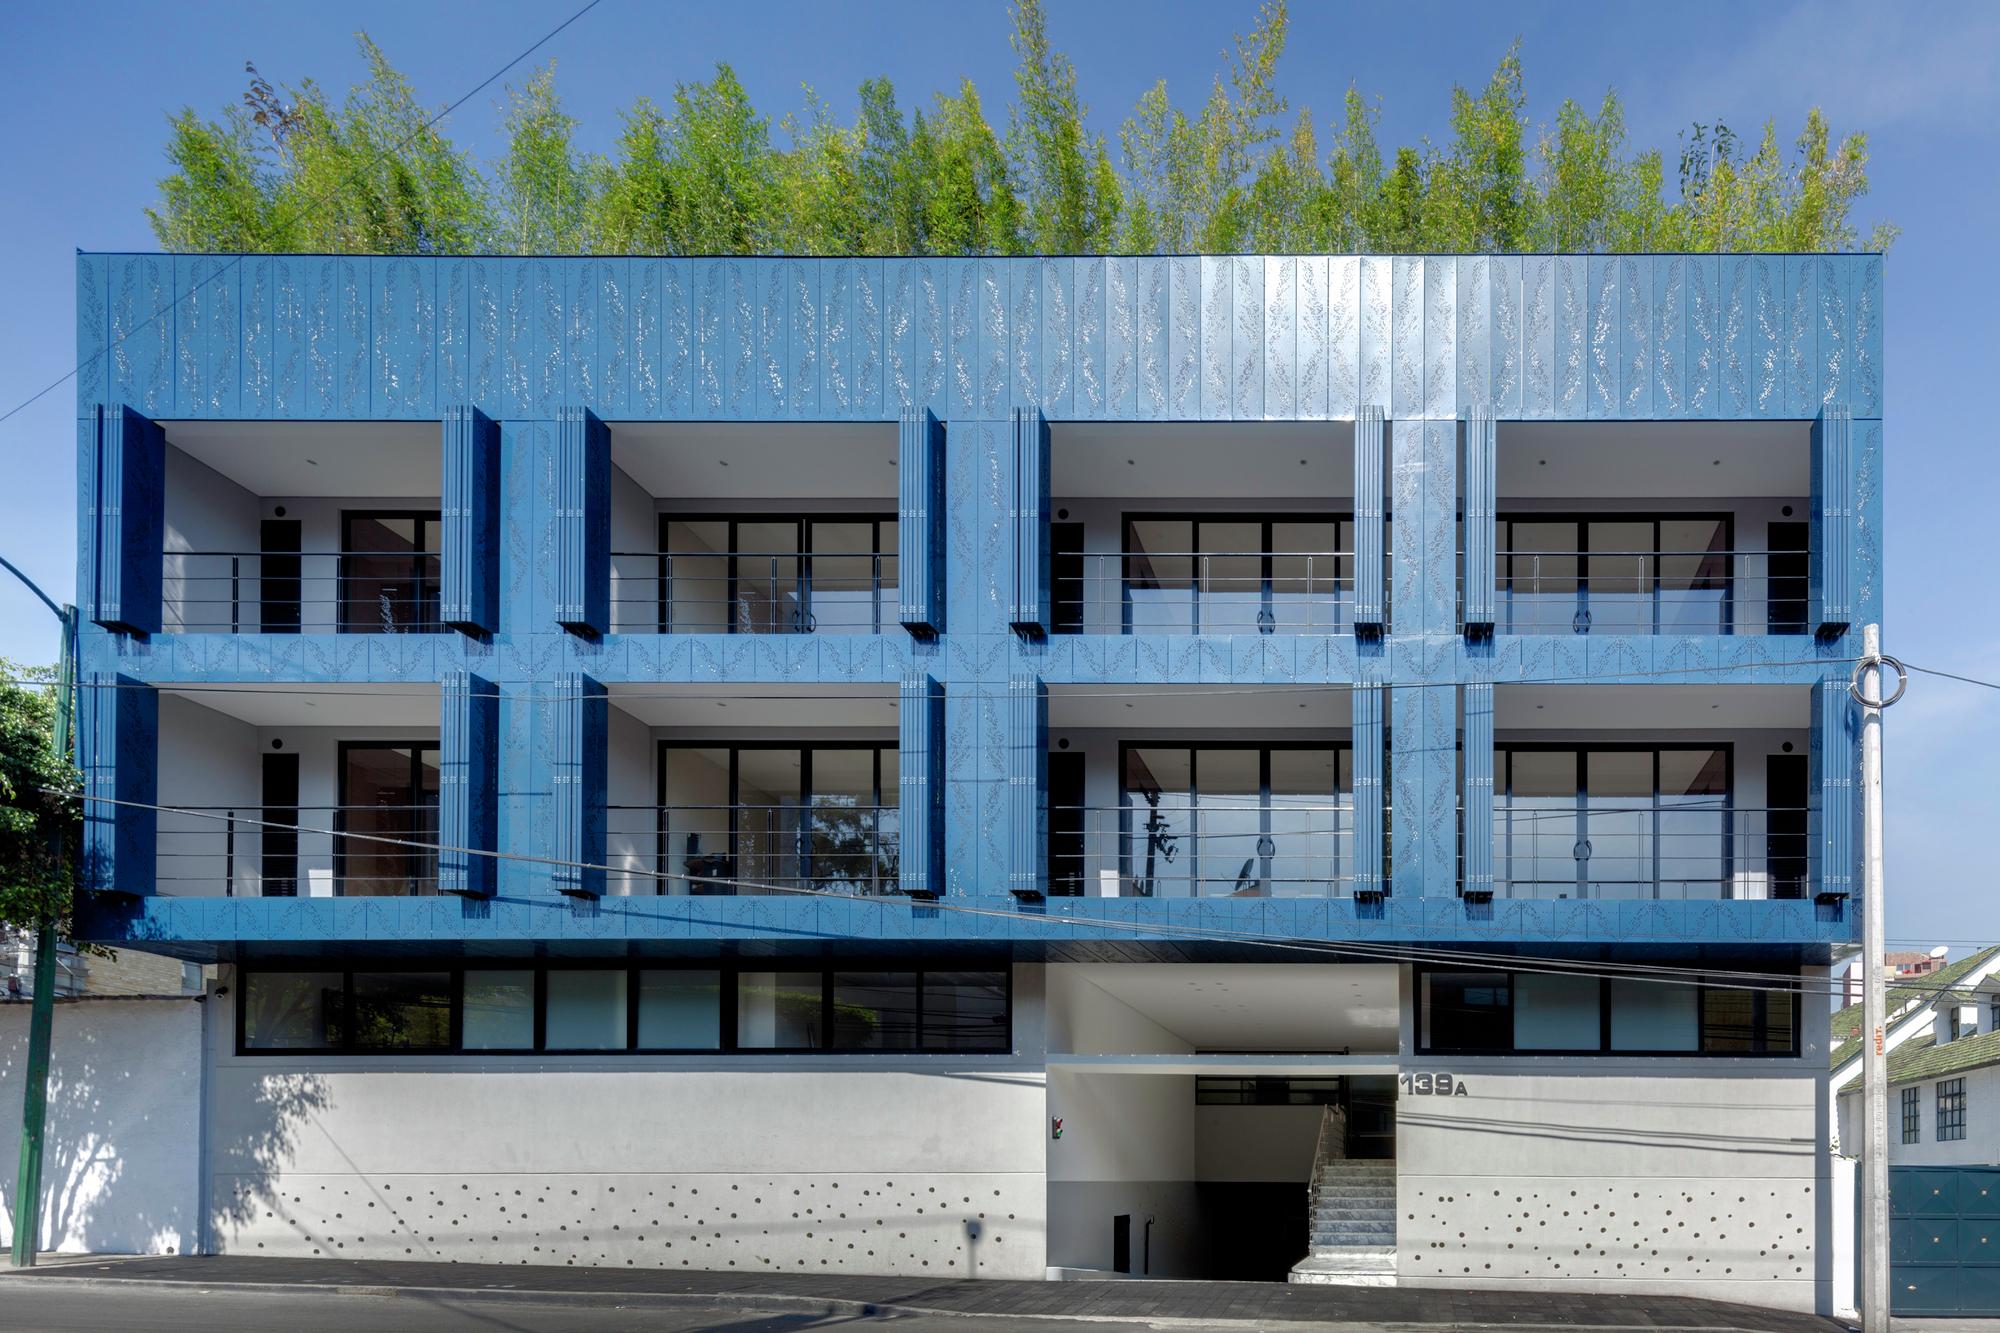 Gallery of tk139 at103 10 for Fachadas de apartamentos modernas